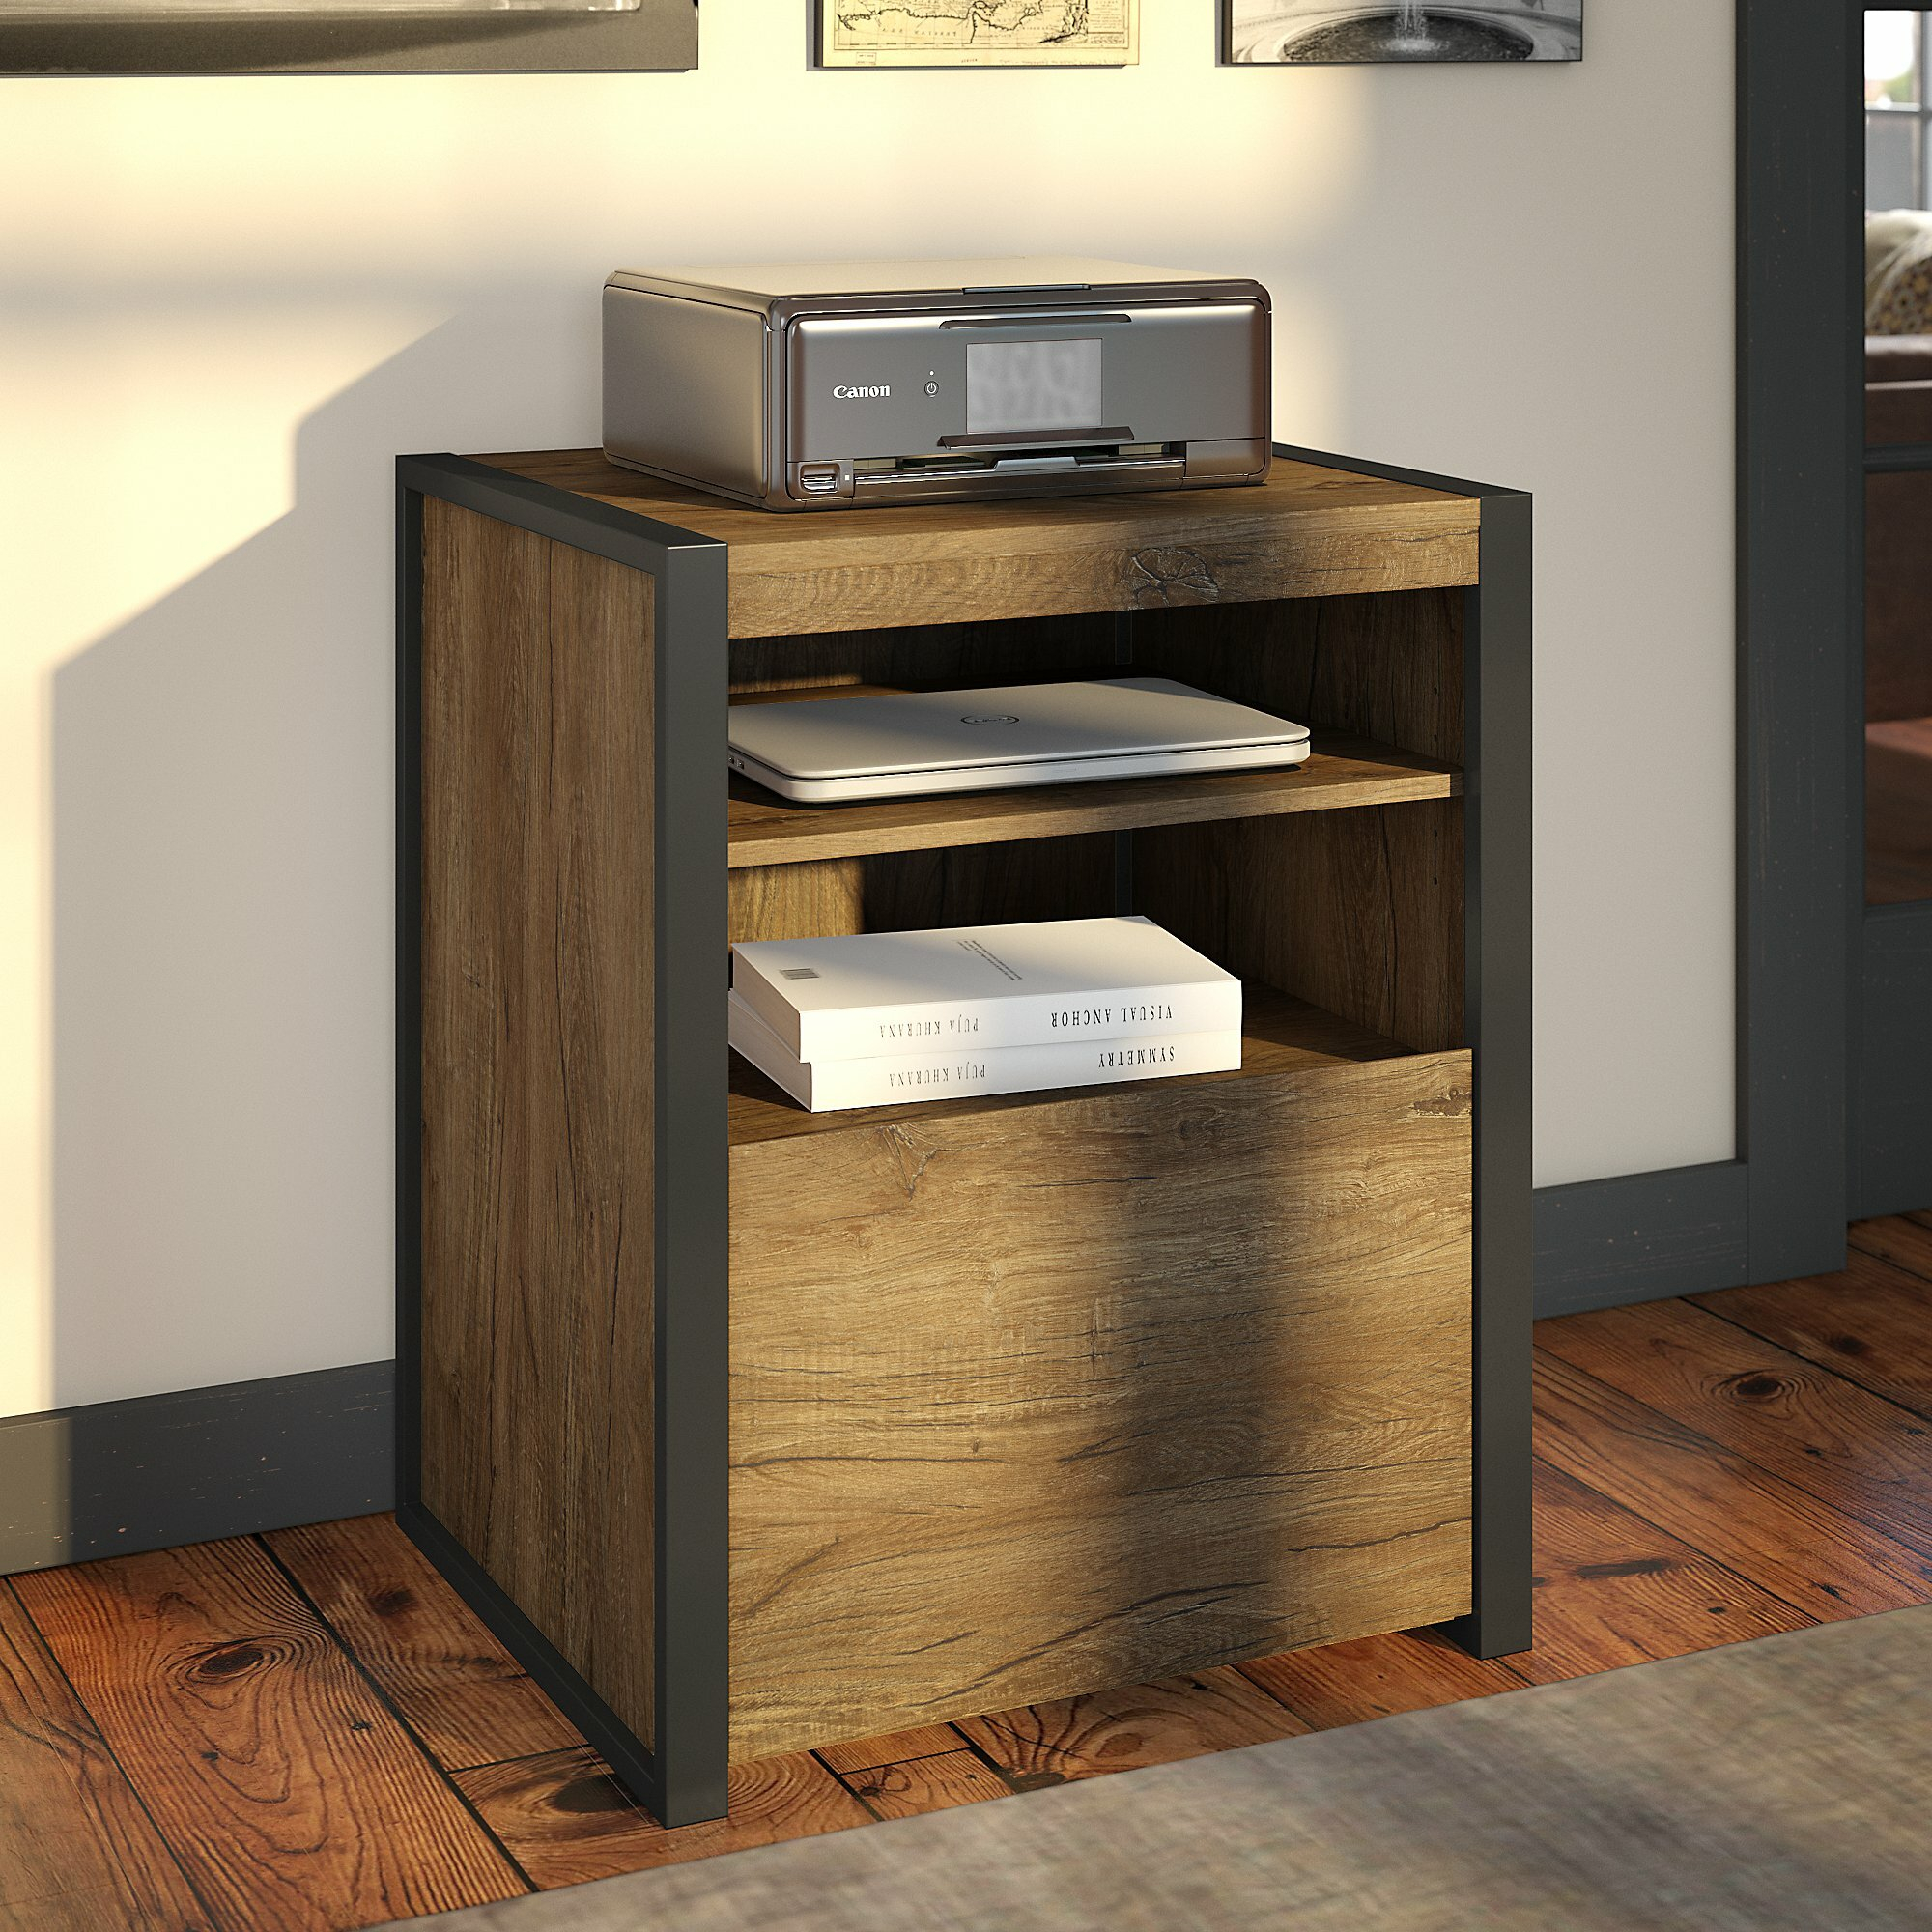 Brayden Studio Eliezer Printer Stand 1 Drawer Vertical Filing intended for size 2000 X 2000